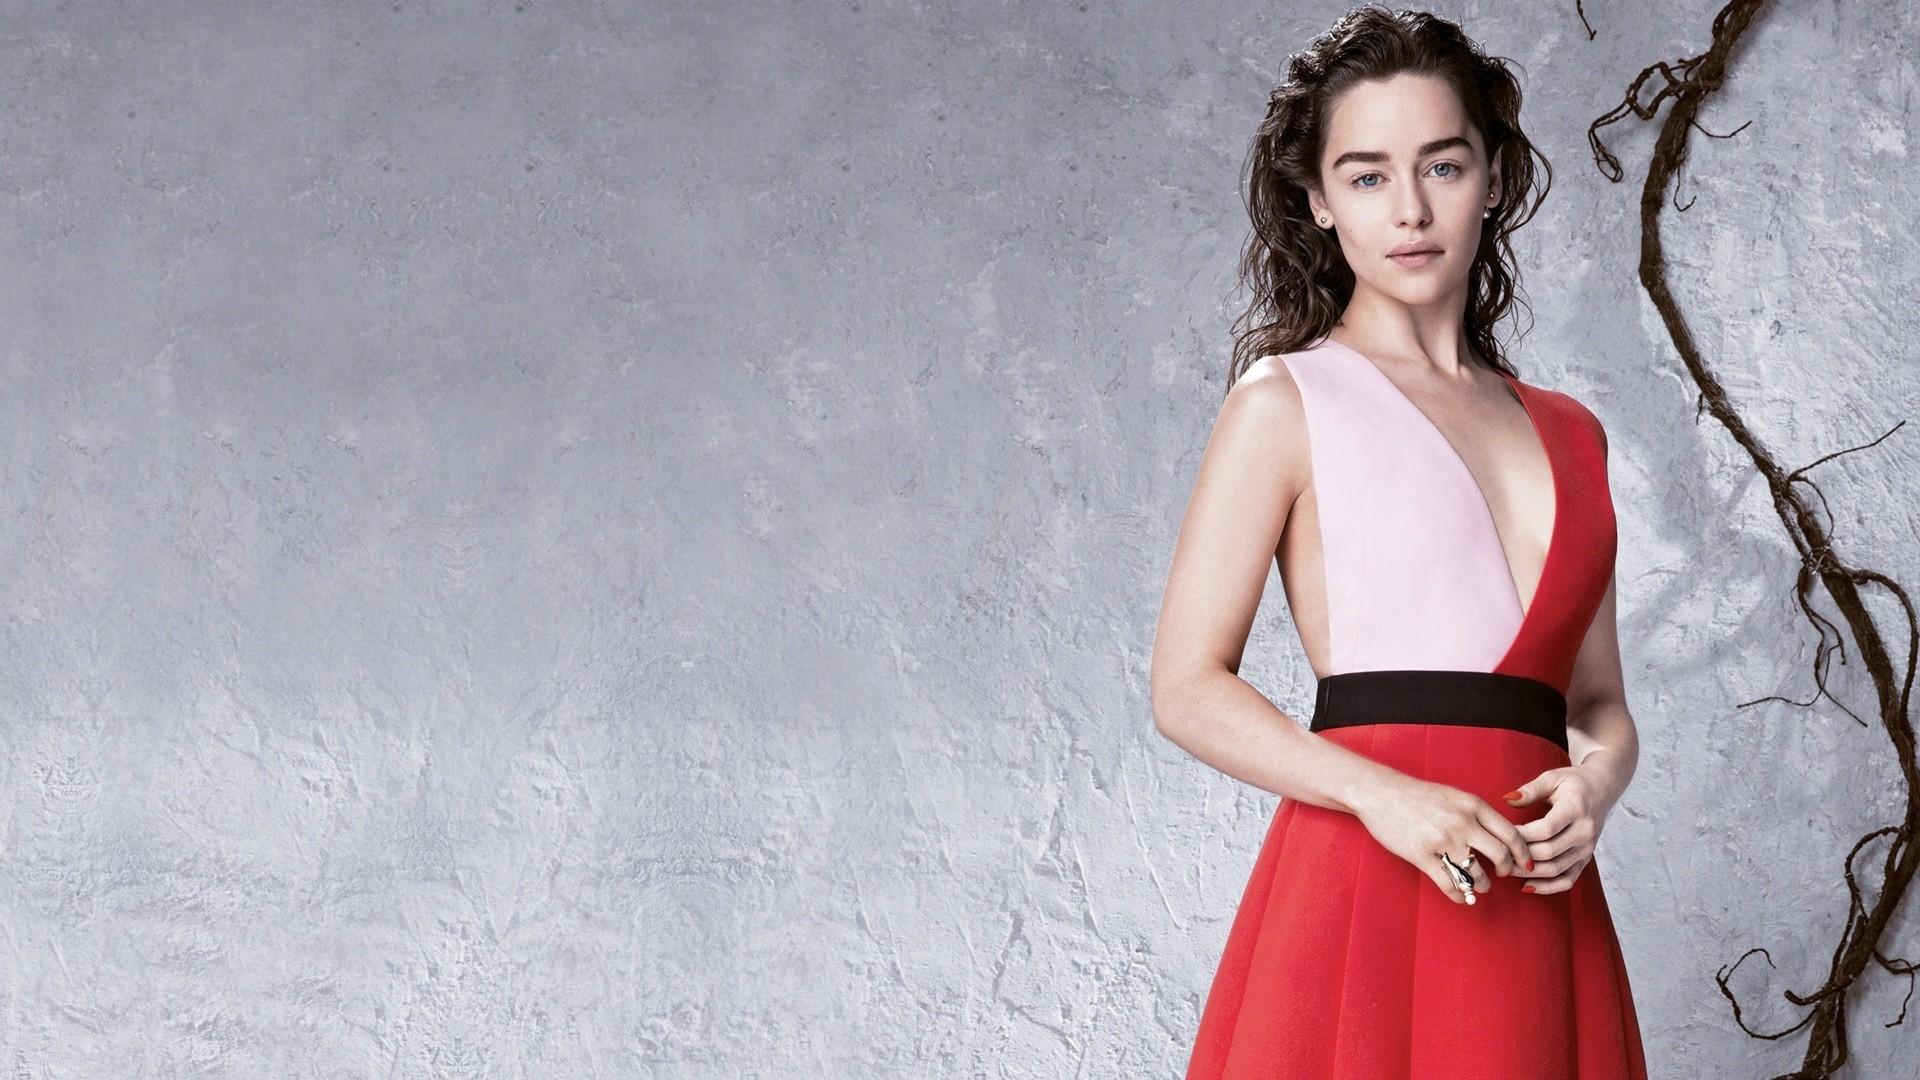 Emilia Clarke Wallpaper Image